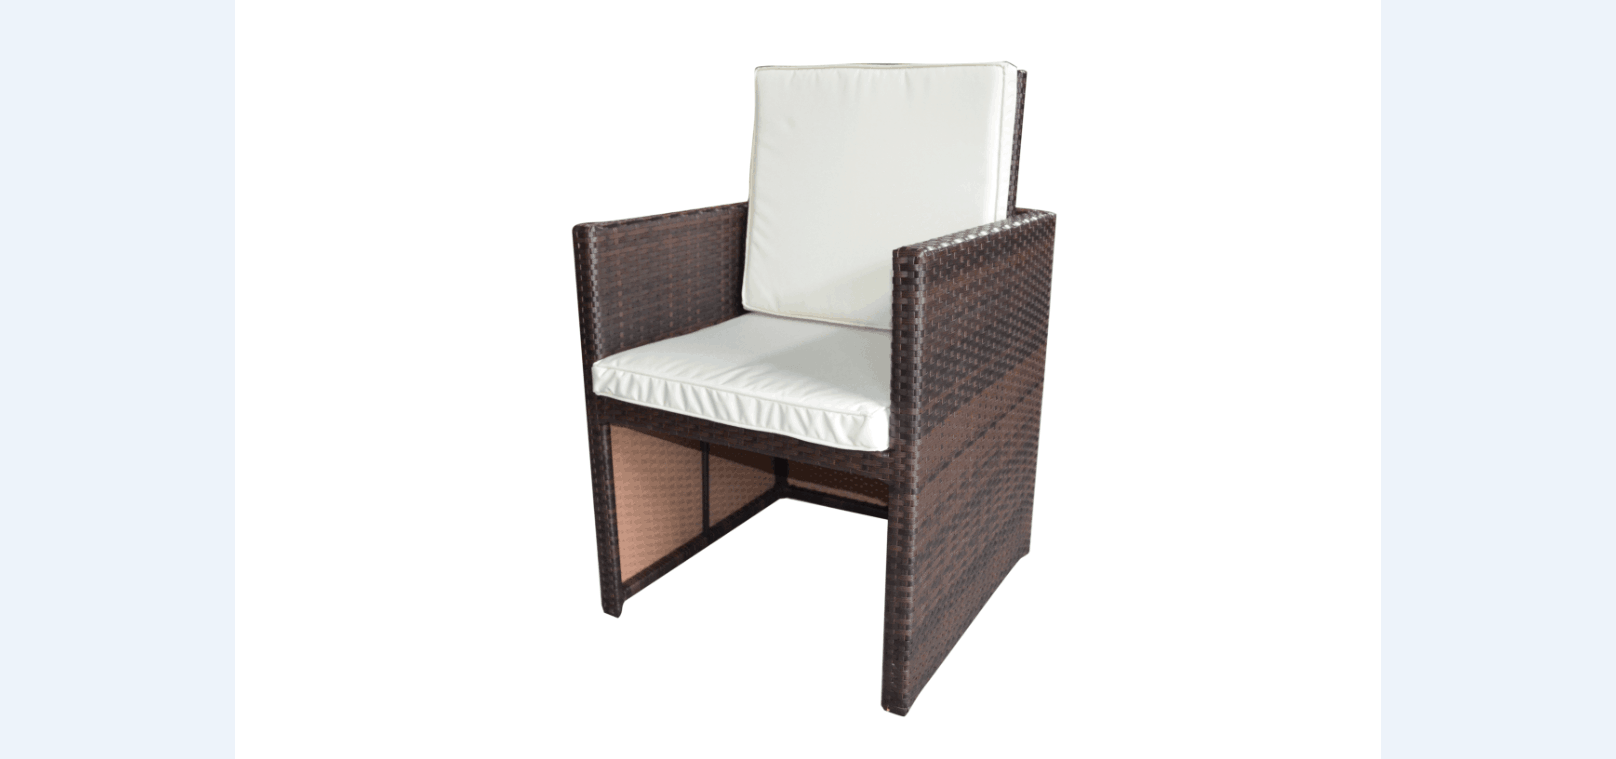 8 seater rio grande garden furniture ireland outdoor for Outdoor furniture ireland